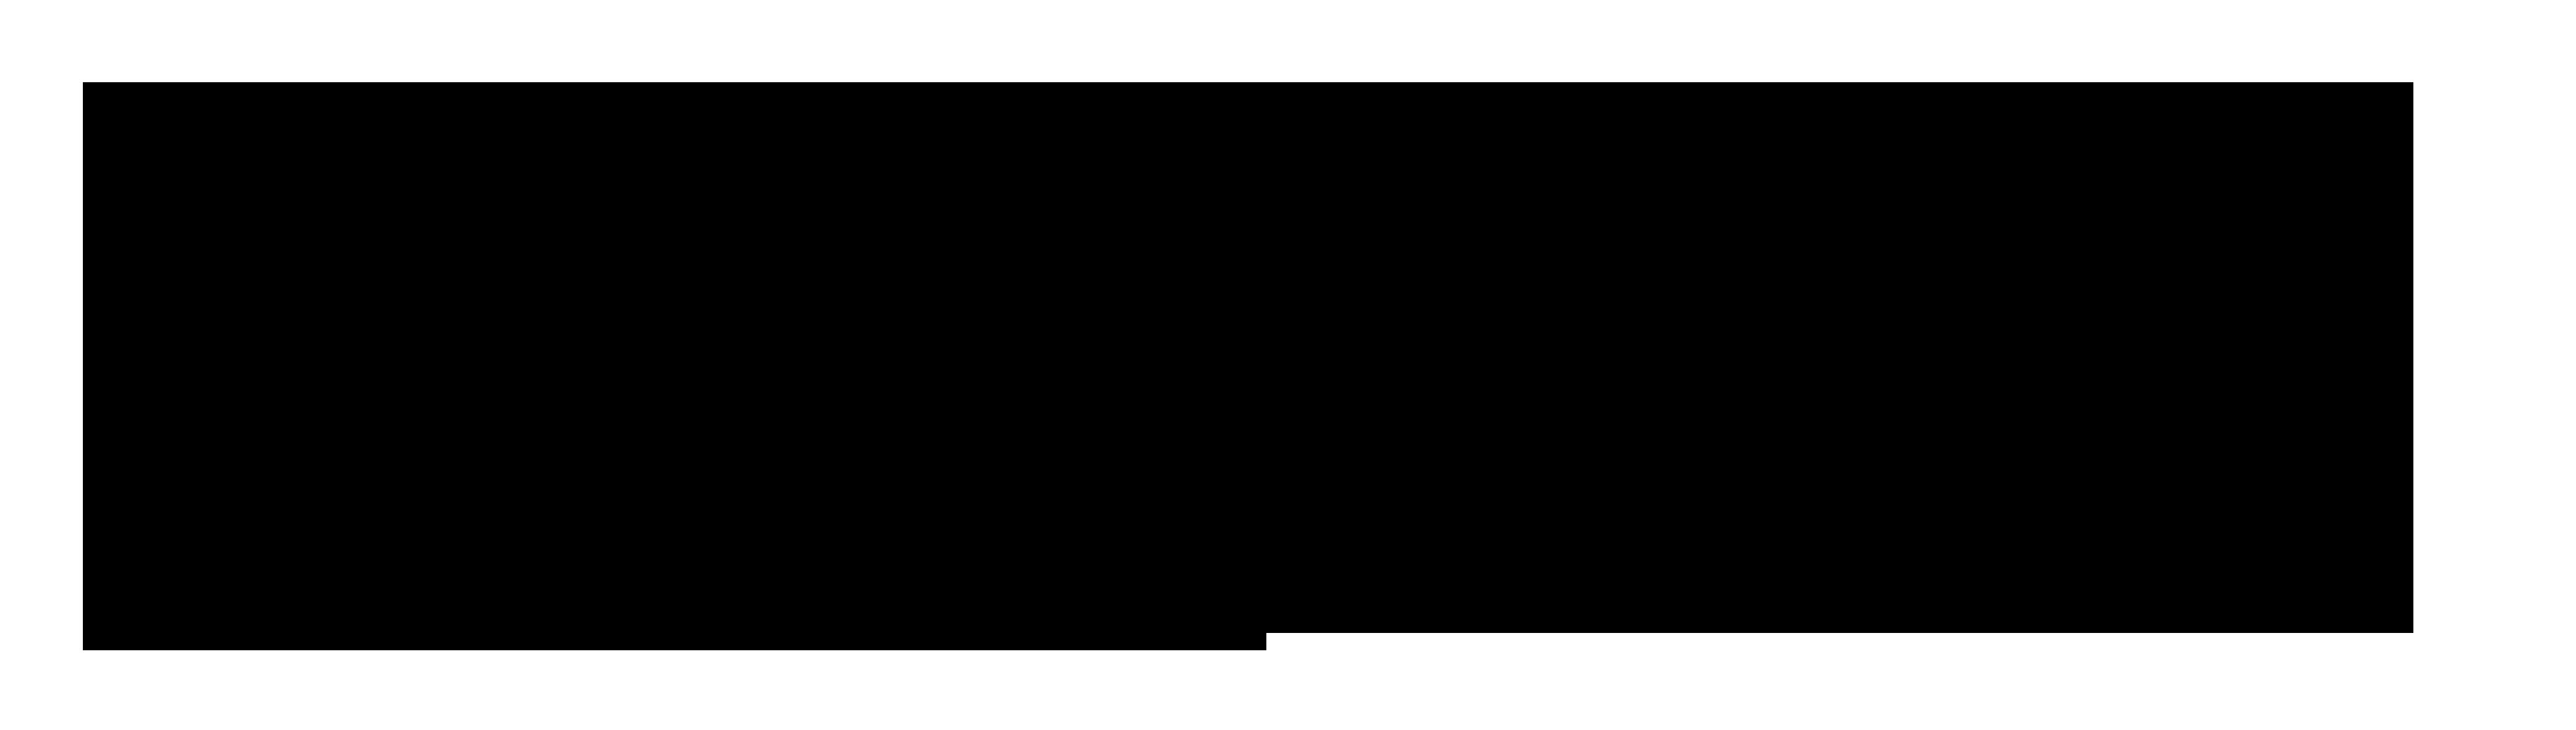 The BrewArt logo